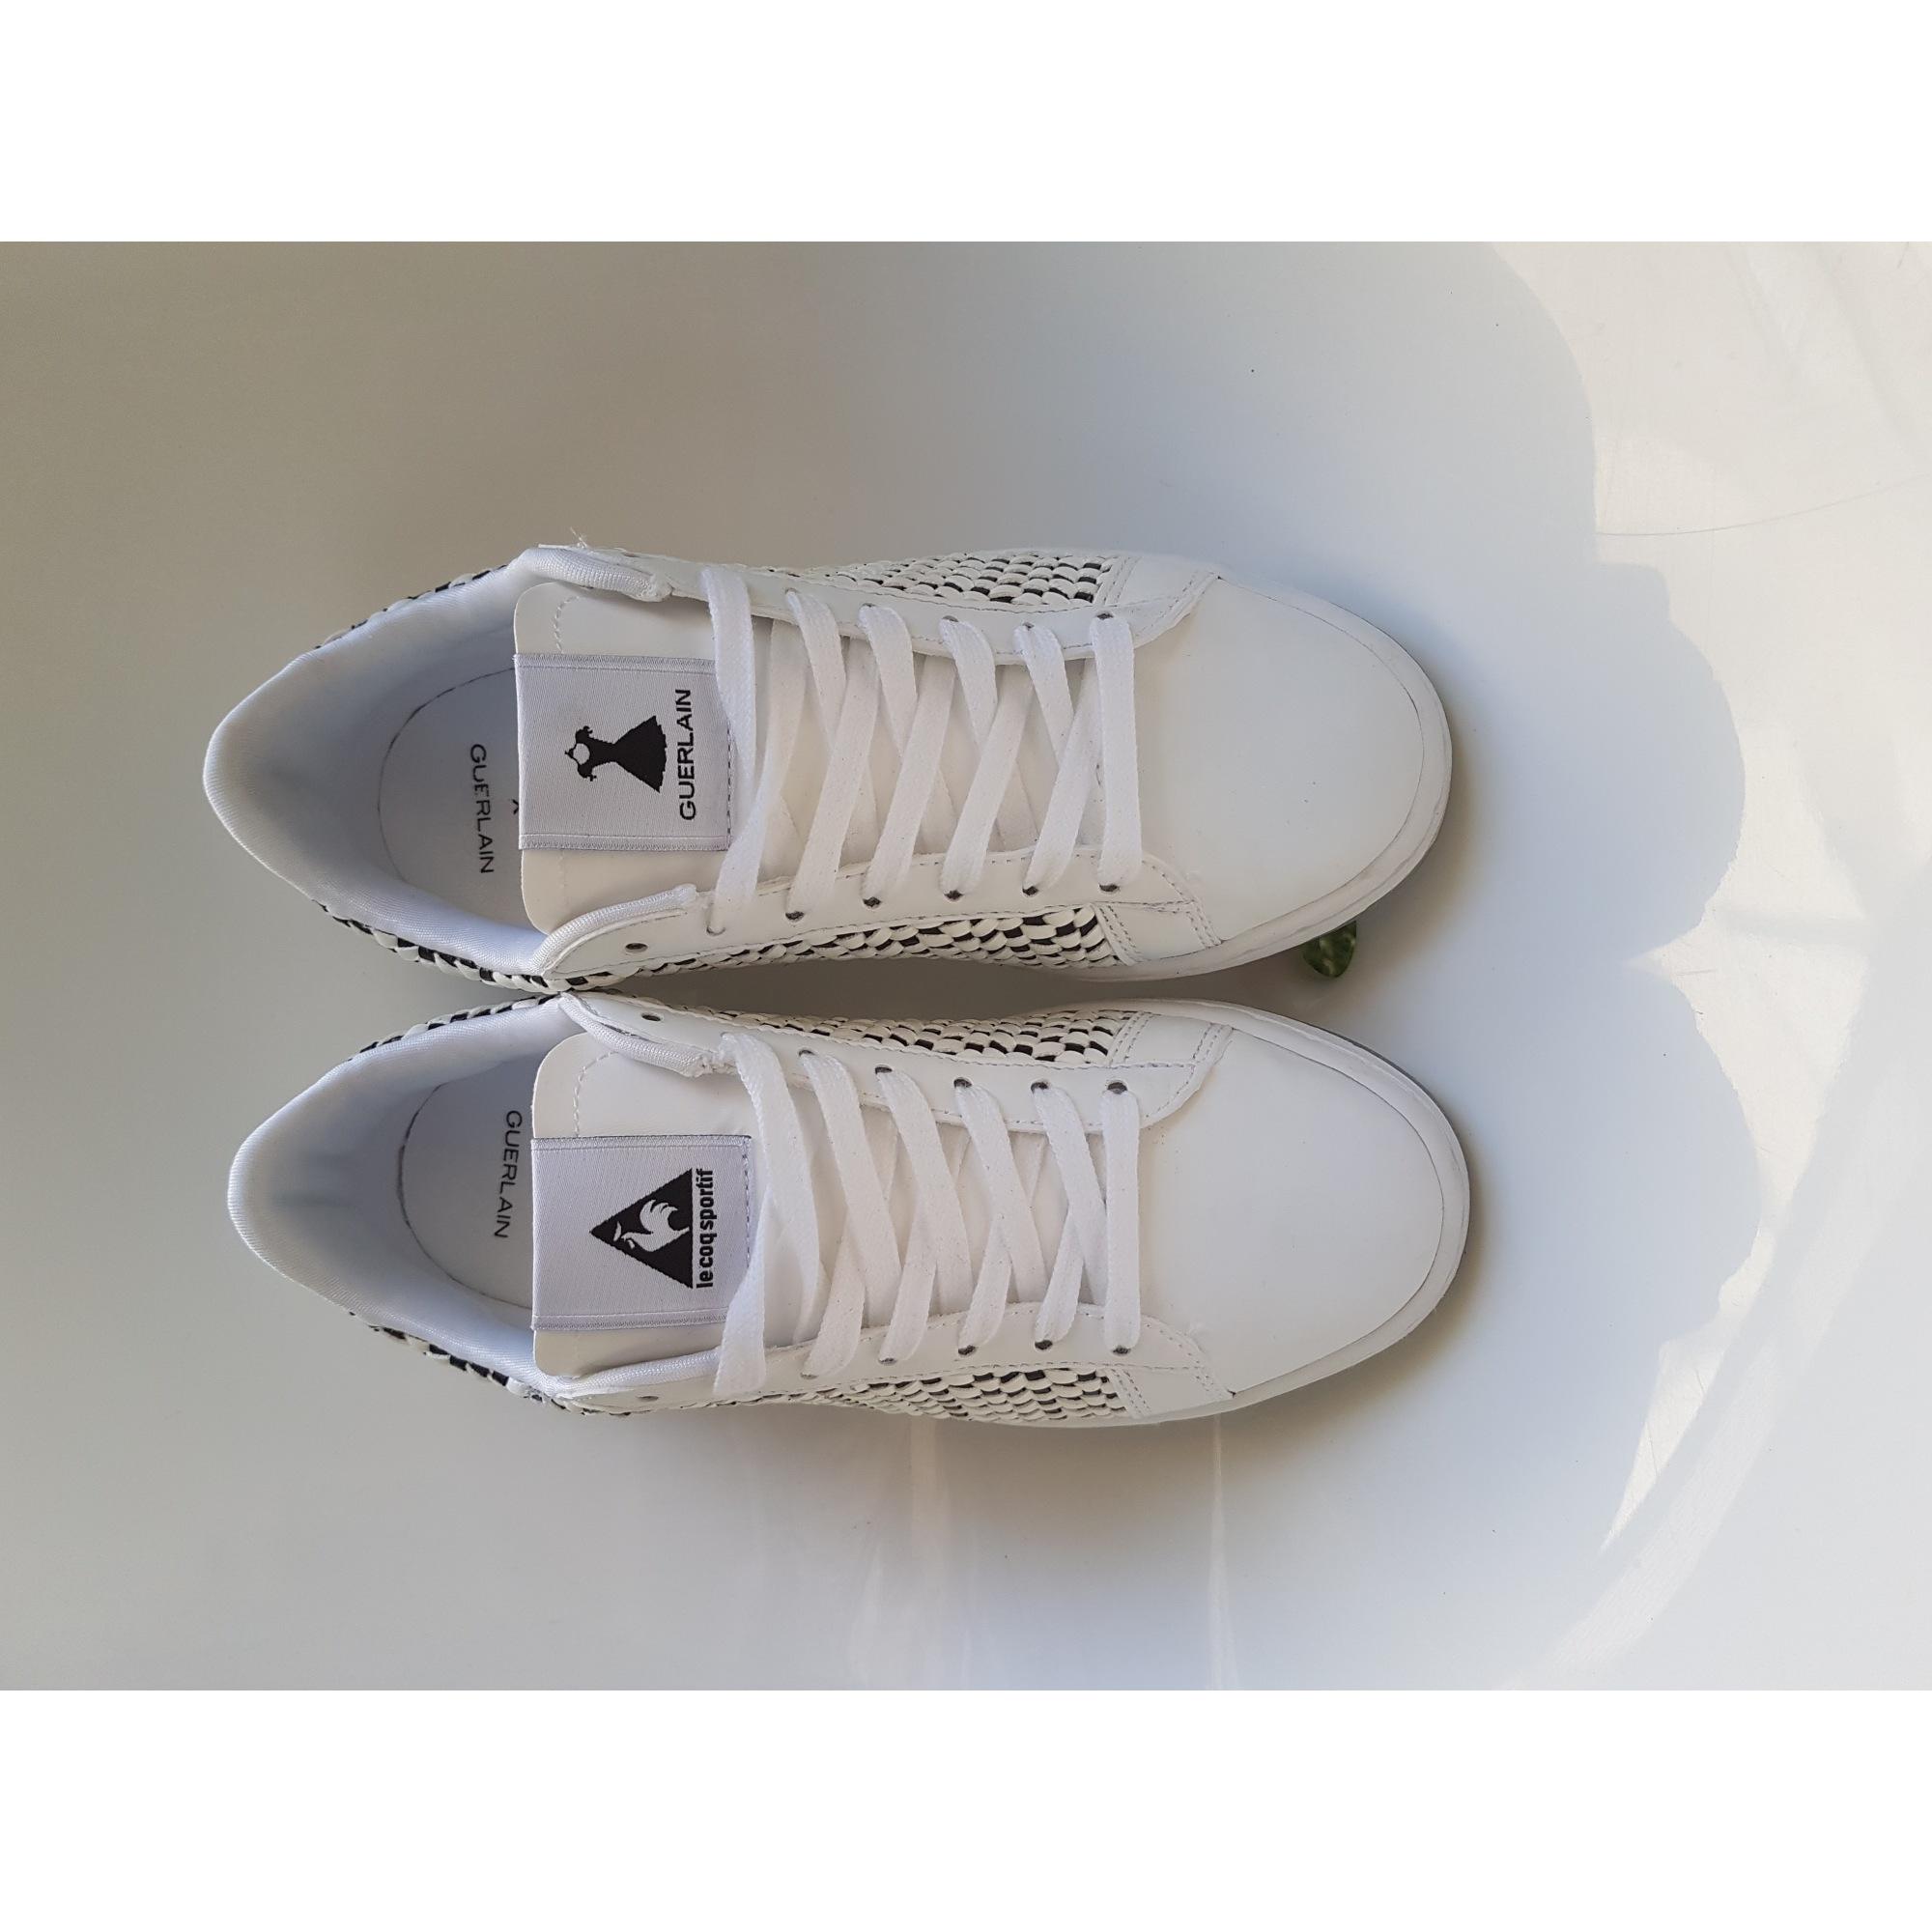 Facon Adidas Chaussure Adidas Chaussure Guerlain H29bEIYDeW